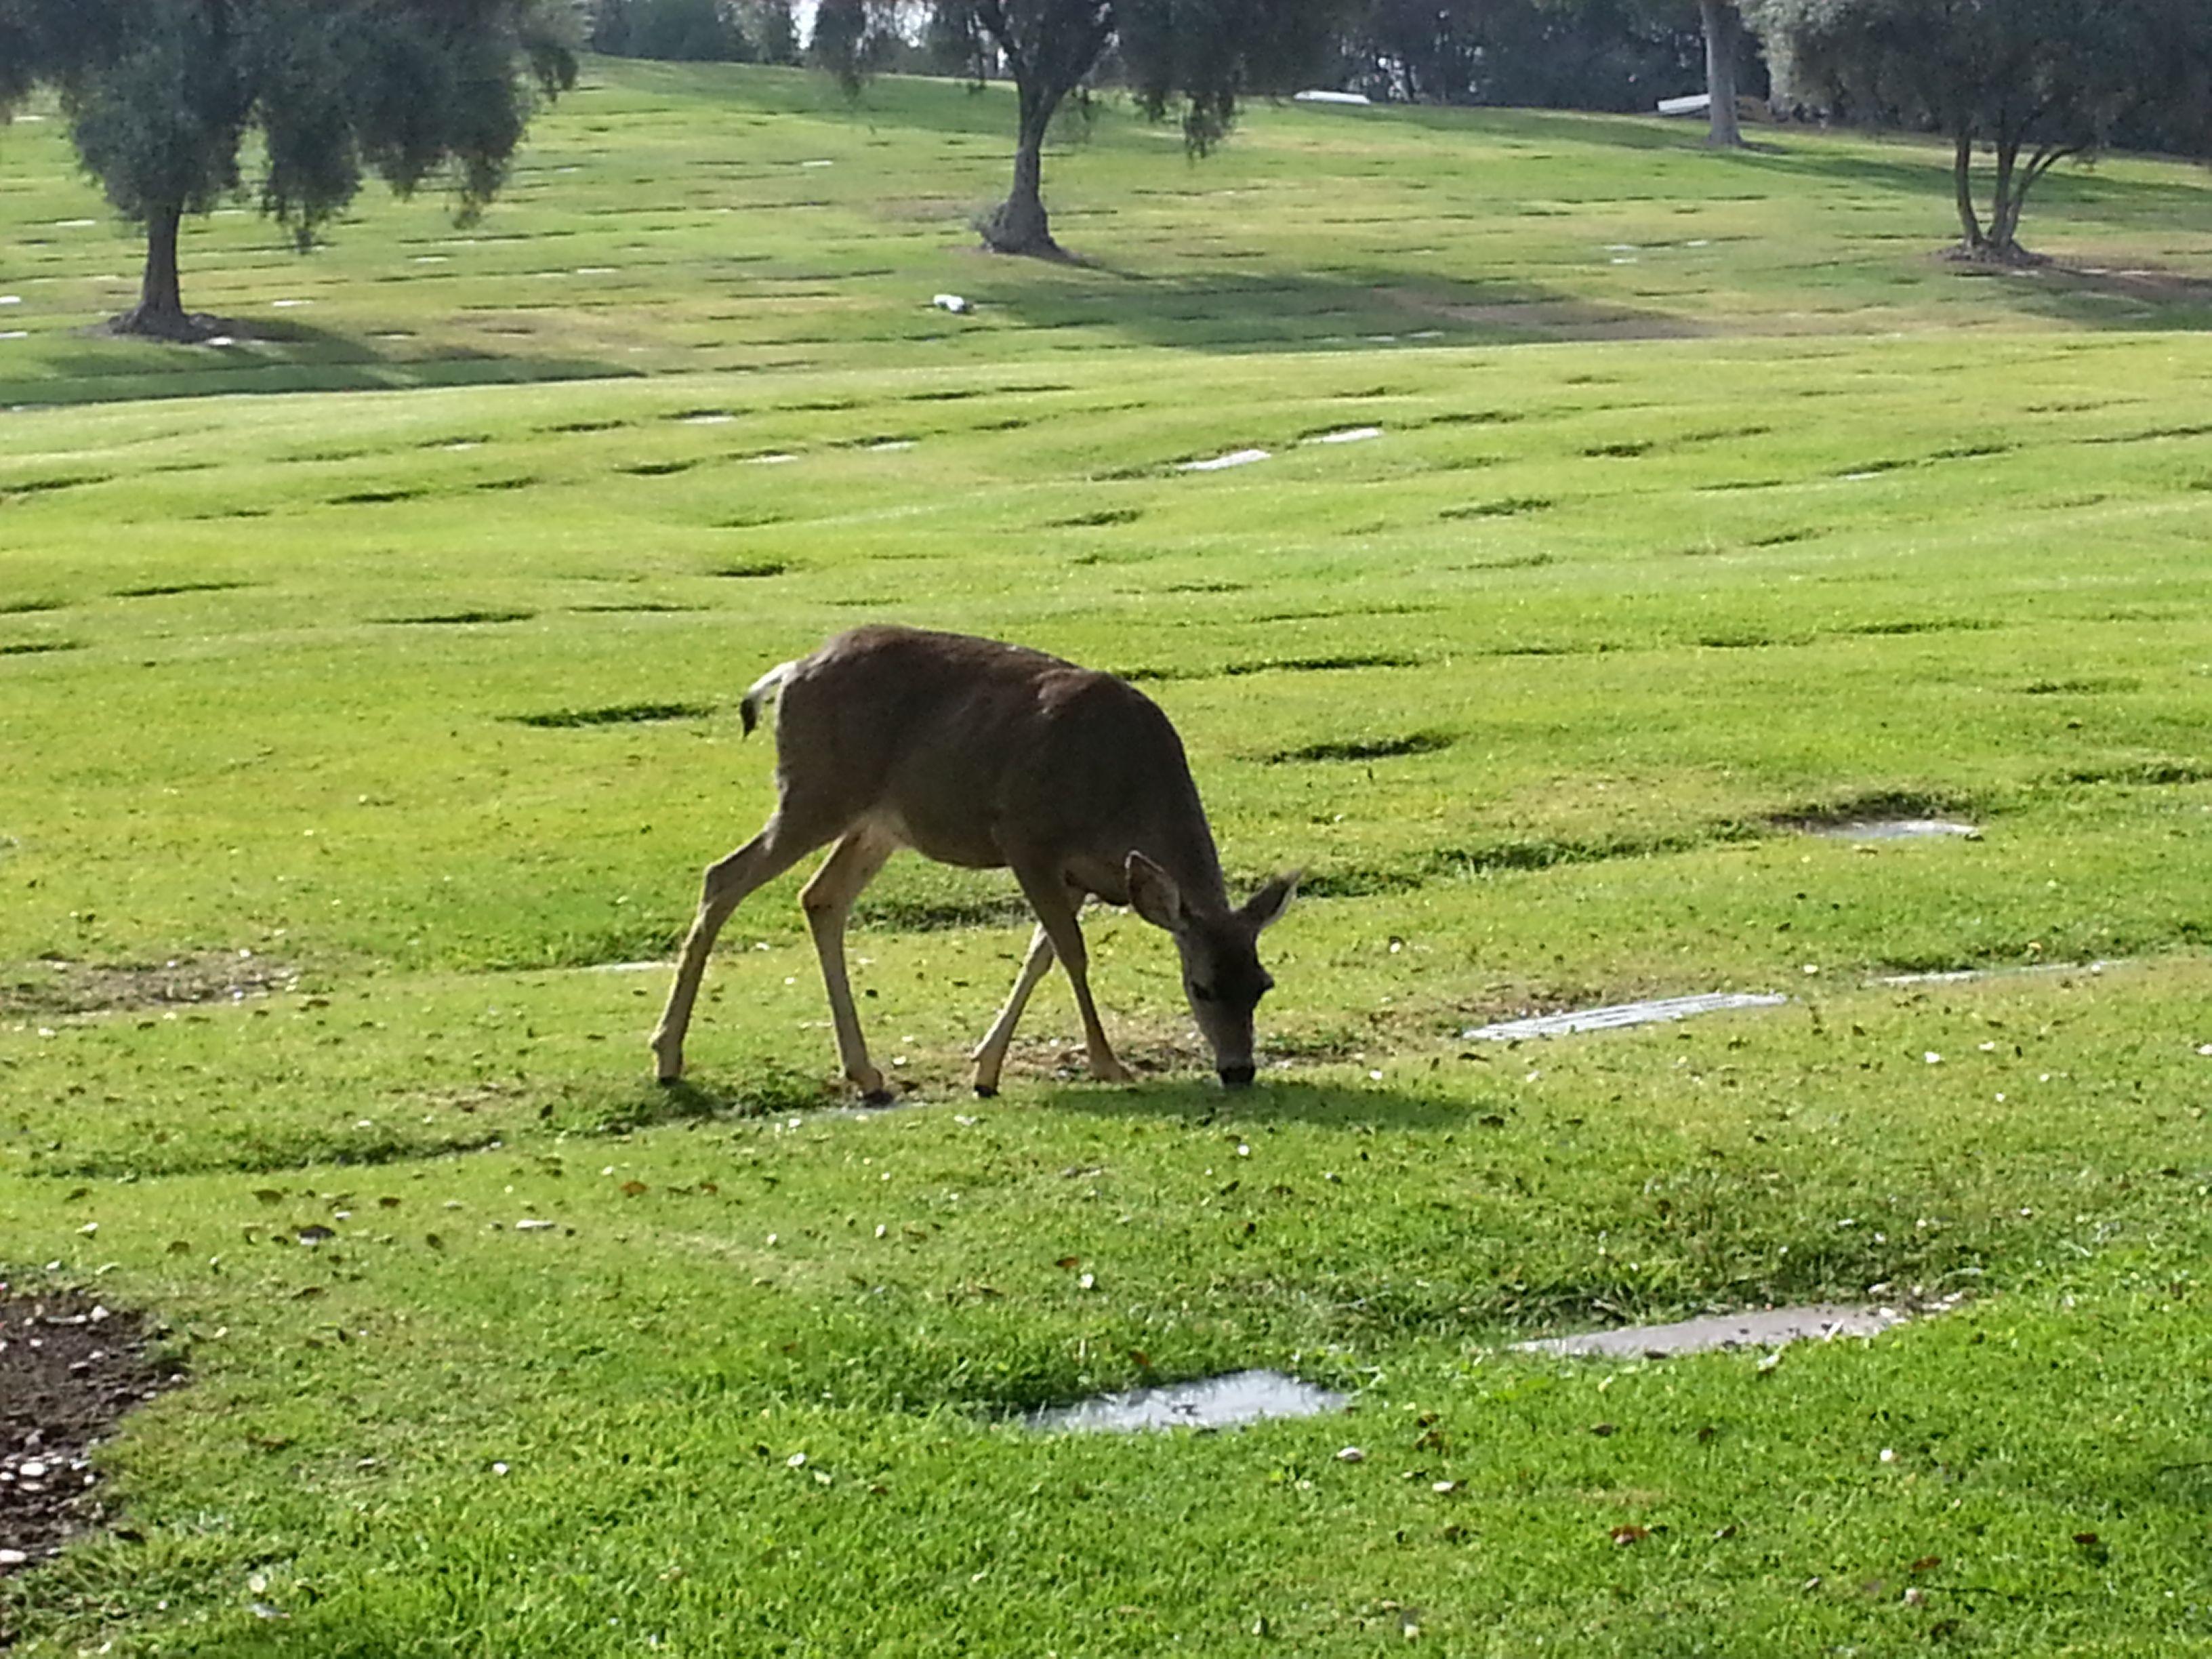 Deer Grazing Near Gate 17 Of Rose Hills Memorial Park In Whittier Calif Www Rosehills Com California Vacation Whittier Whittier California